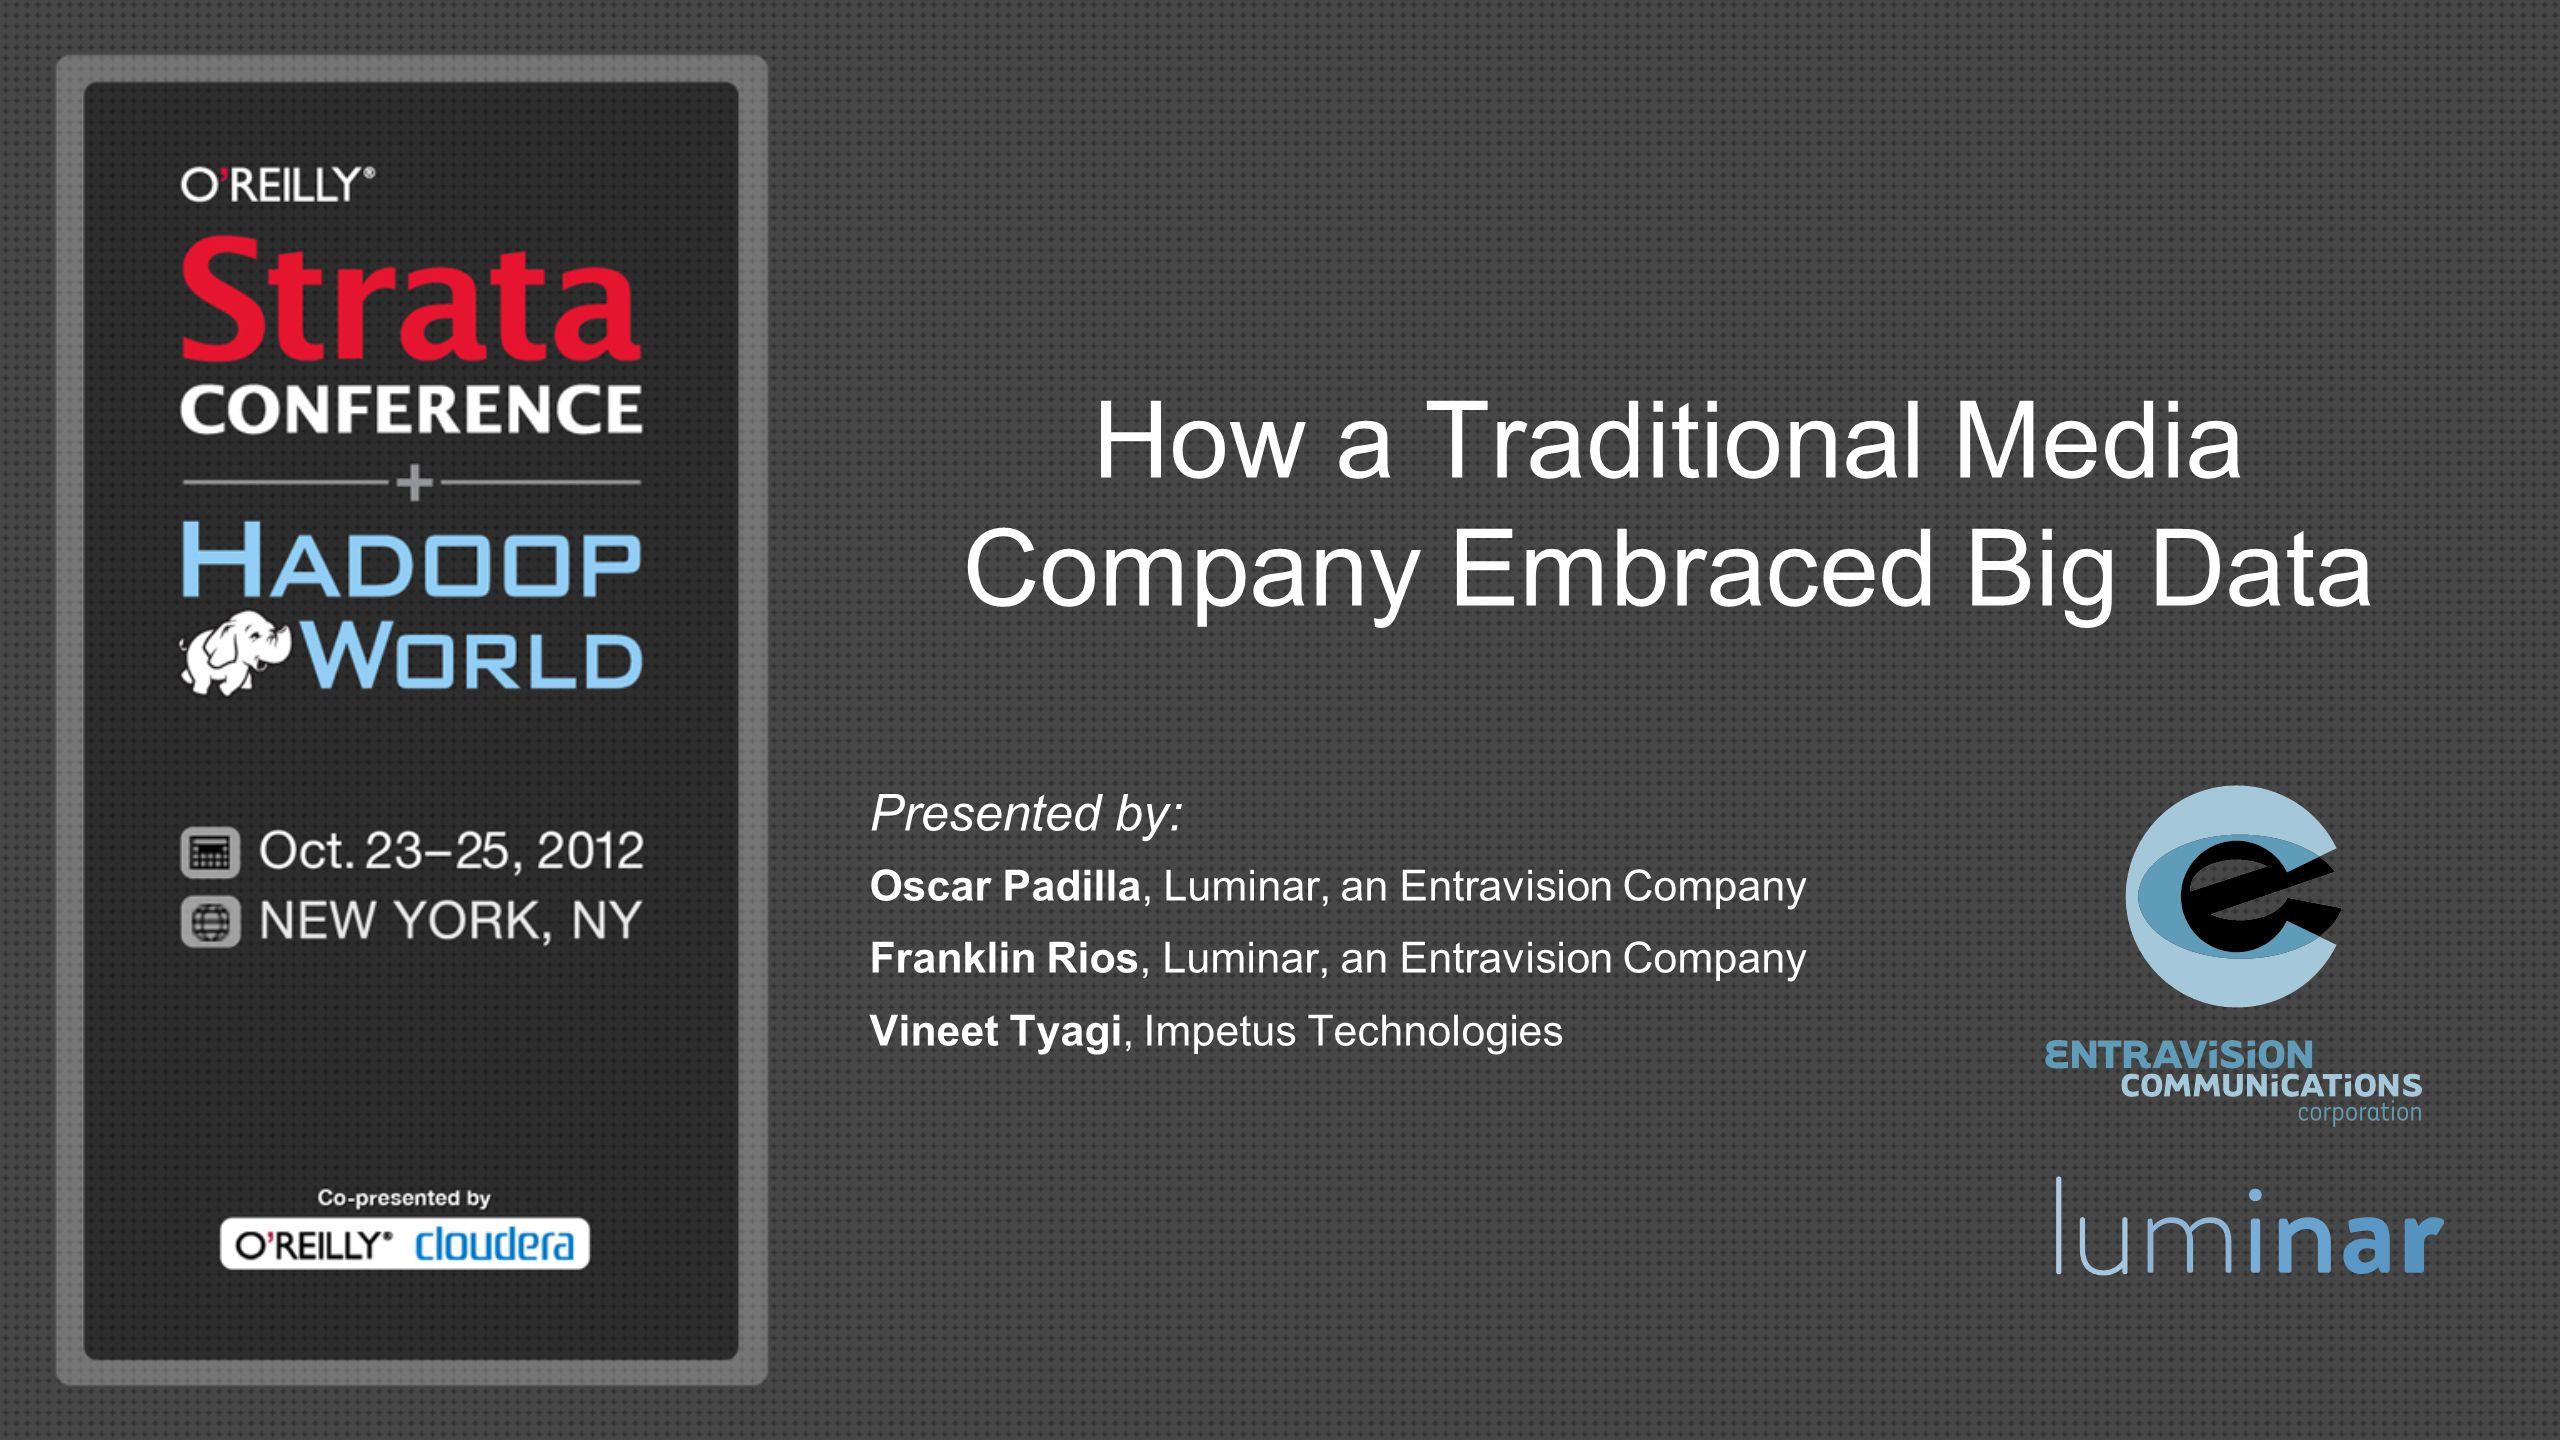 How a Traditional Media Company Embraced Big Data Presented by: Oscar Padilla, Luminar, an Entravision Company Franklin Rios, Luminar, an Entravision